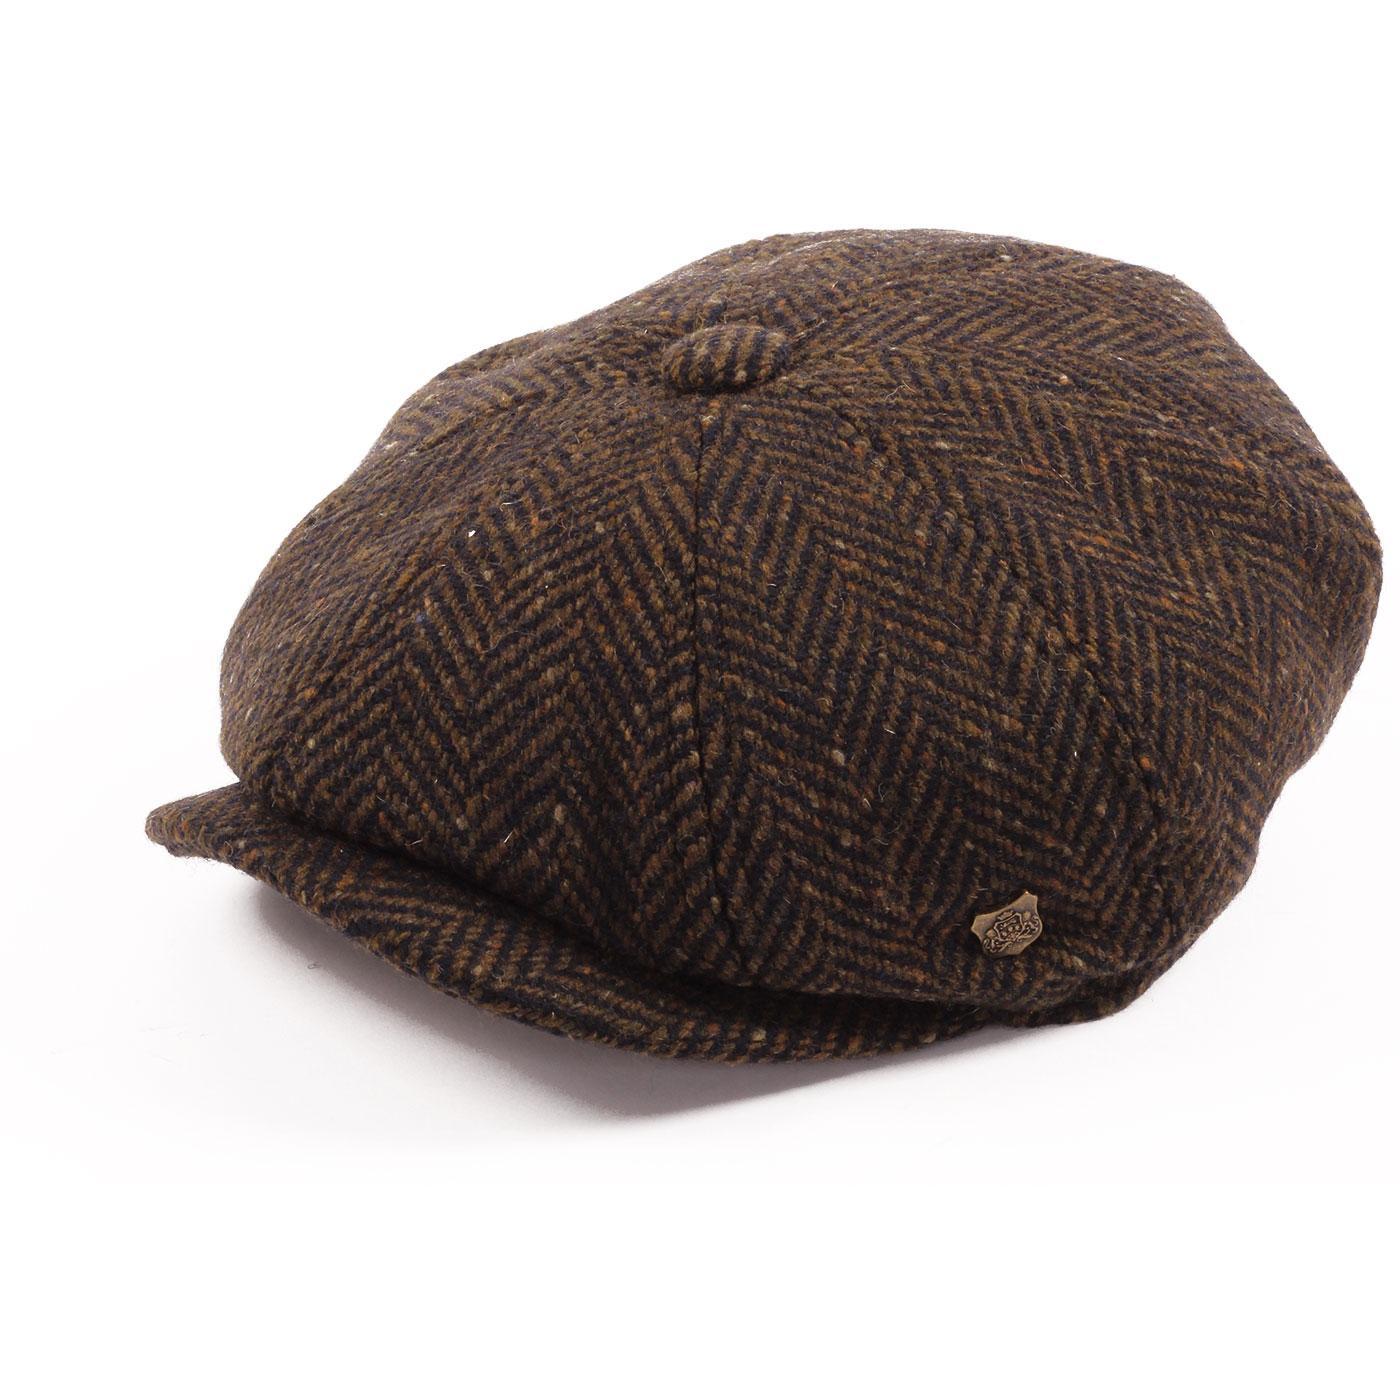 Malmo FAILSWORTH Magee Tweed Bakerboy Cap BROWN